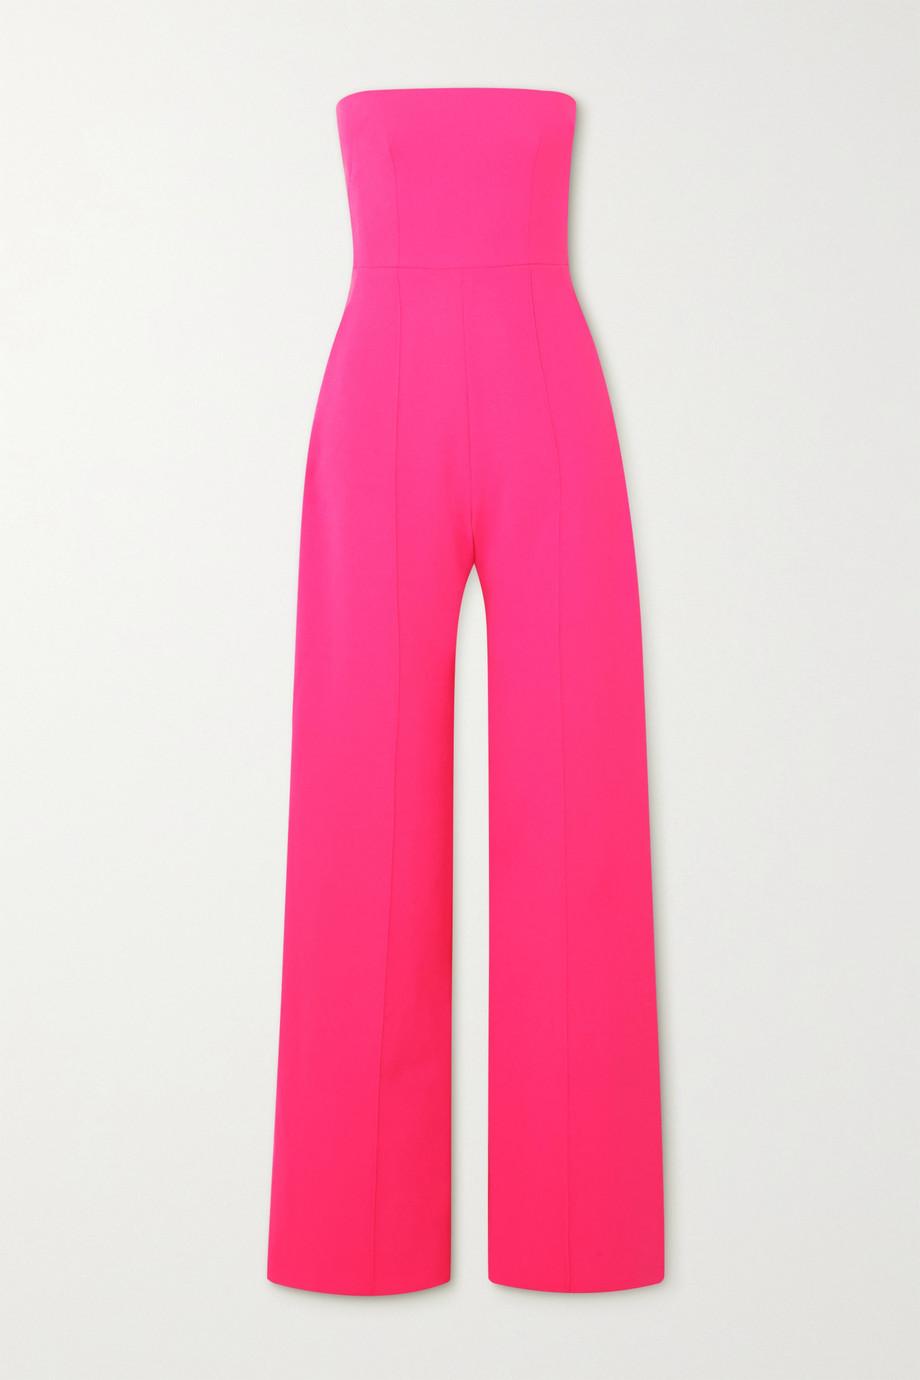 Alex Perry Mandel strapless neon stretch-crepe jumpsuit